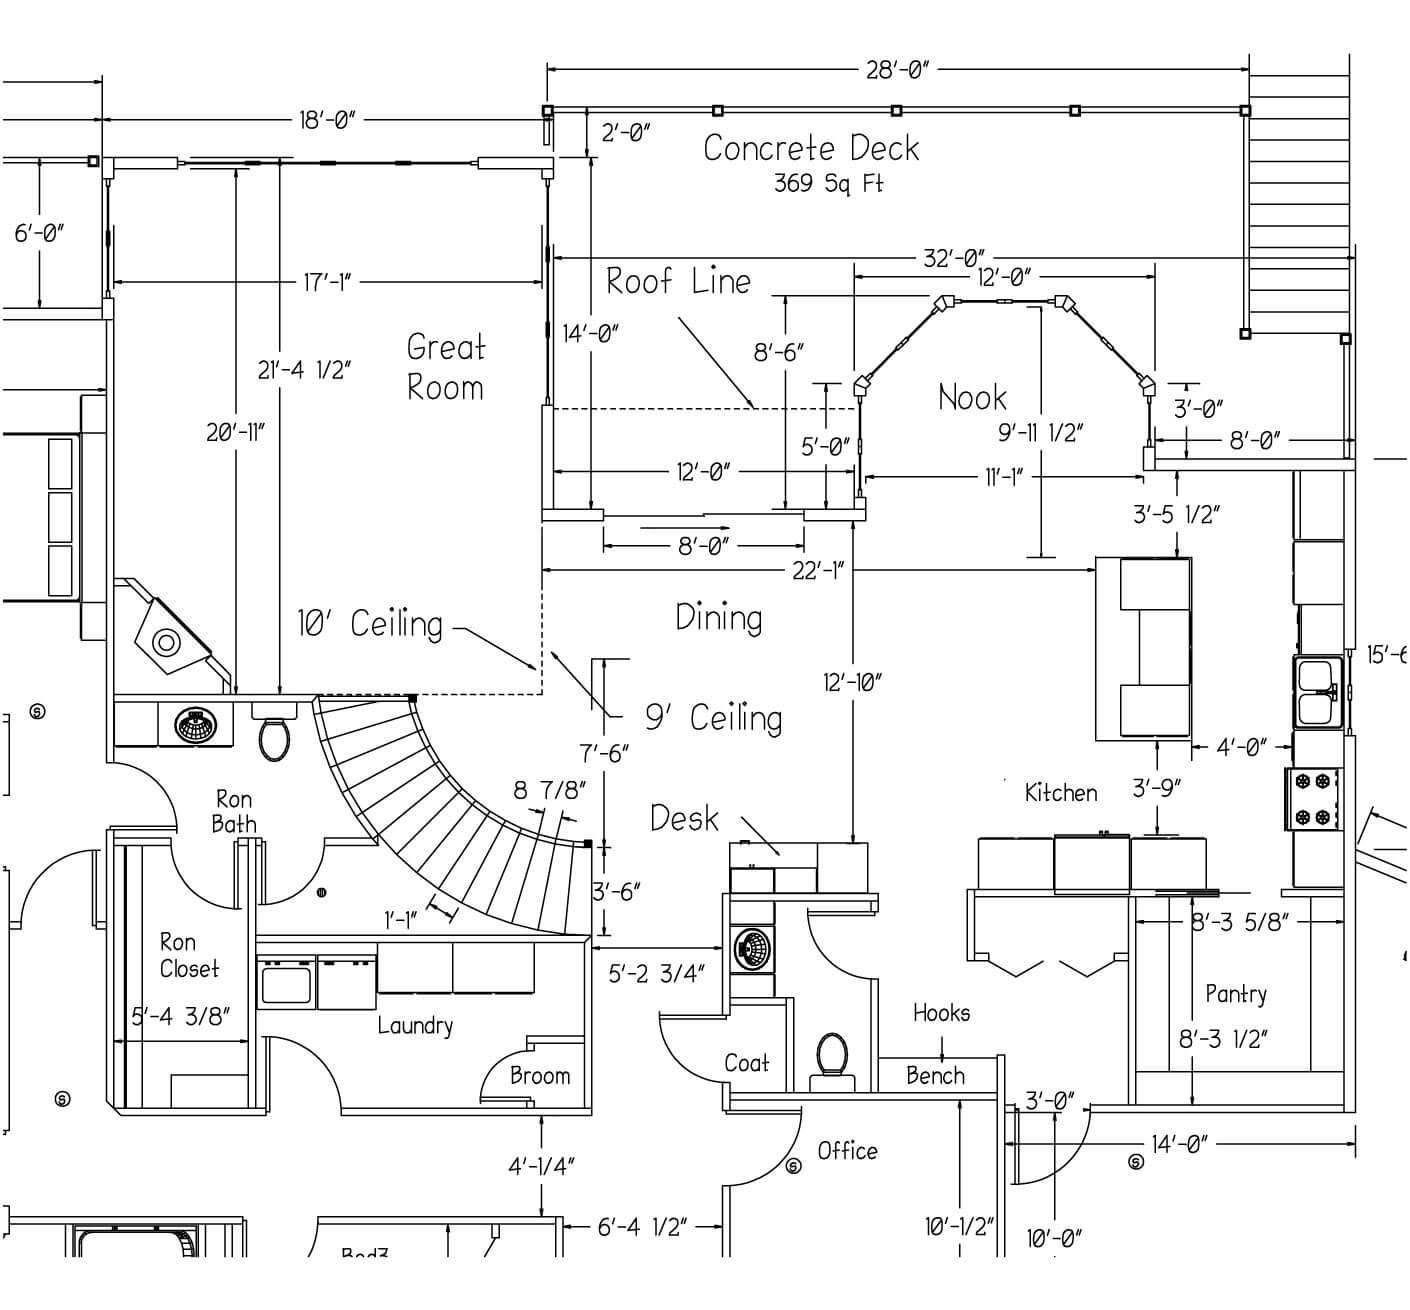 Vollink Construction - Planning